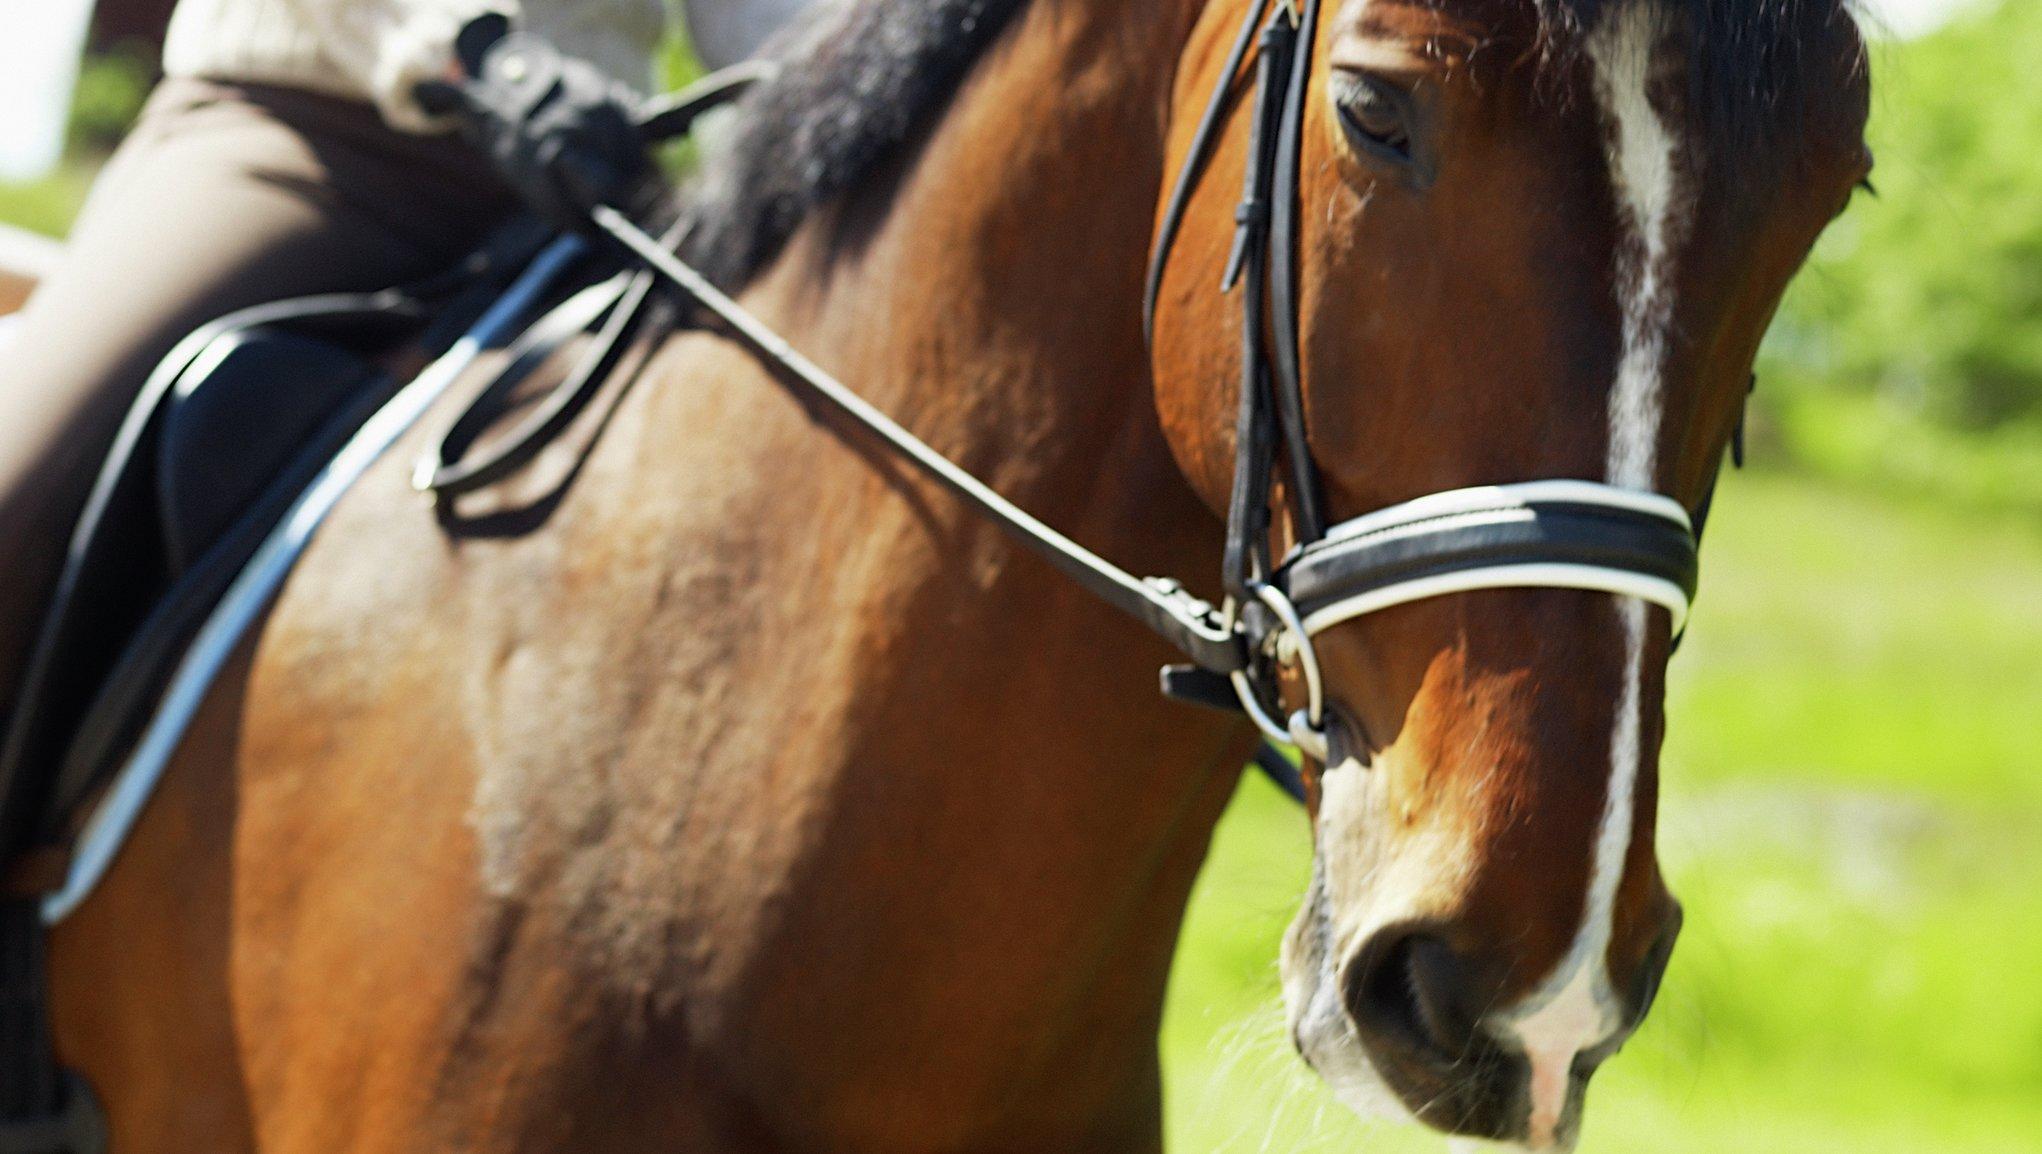 Hevosvakuutus